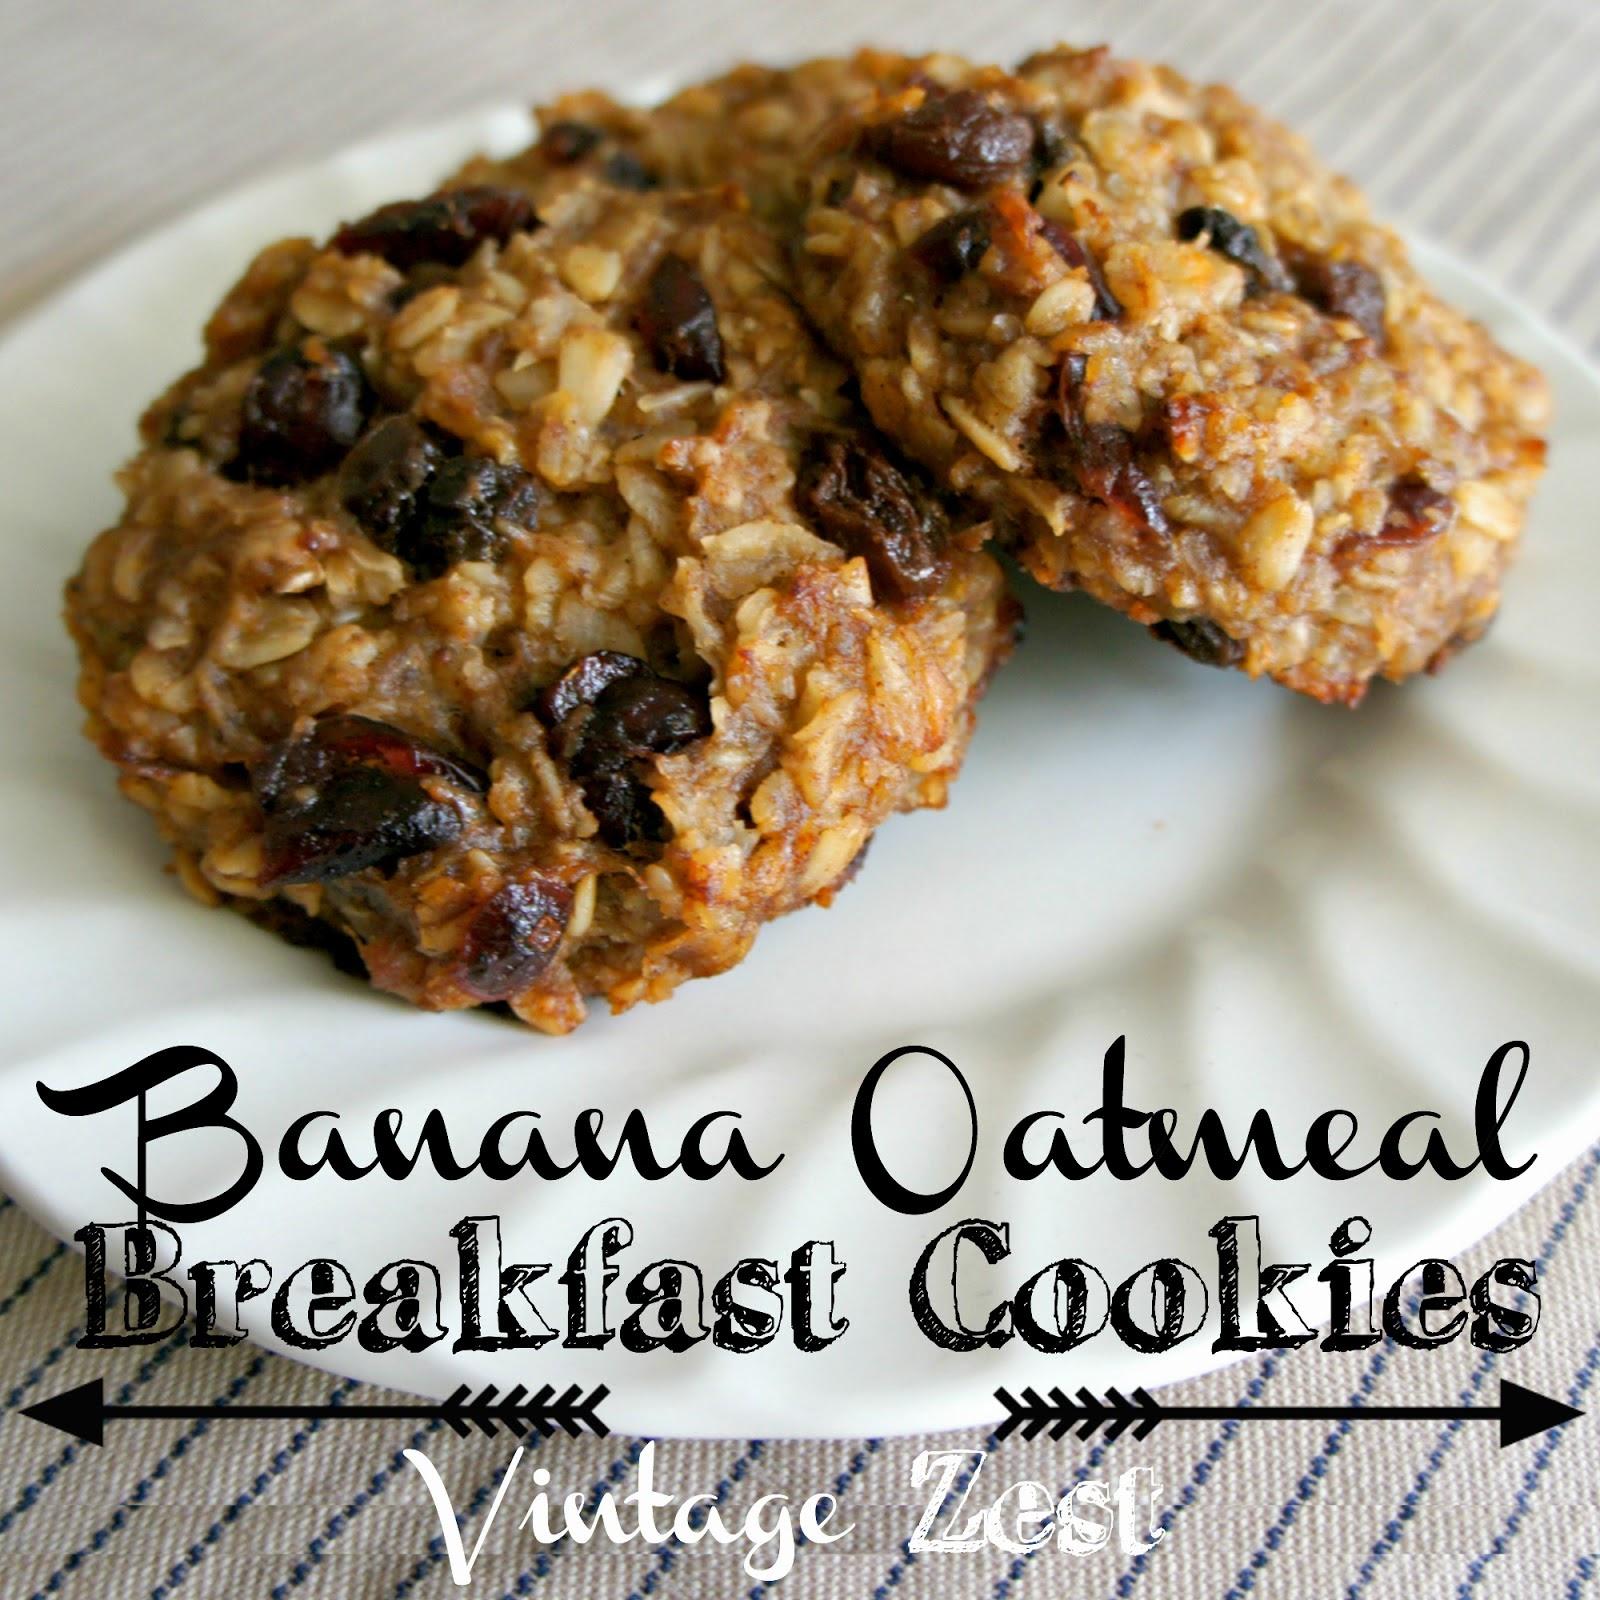 http://www.vintagezest.com/2013/06/favorite-breakfast-4-banana-oatmeal.html